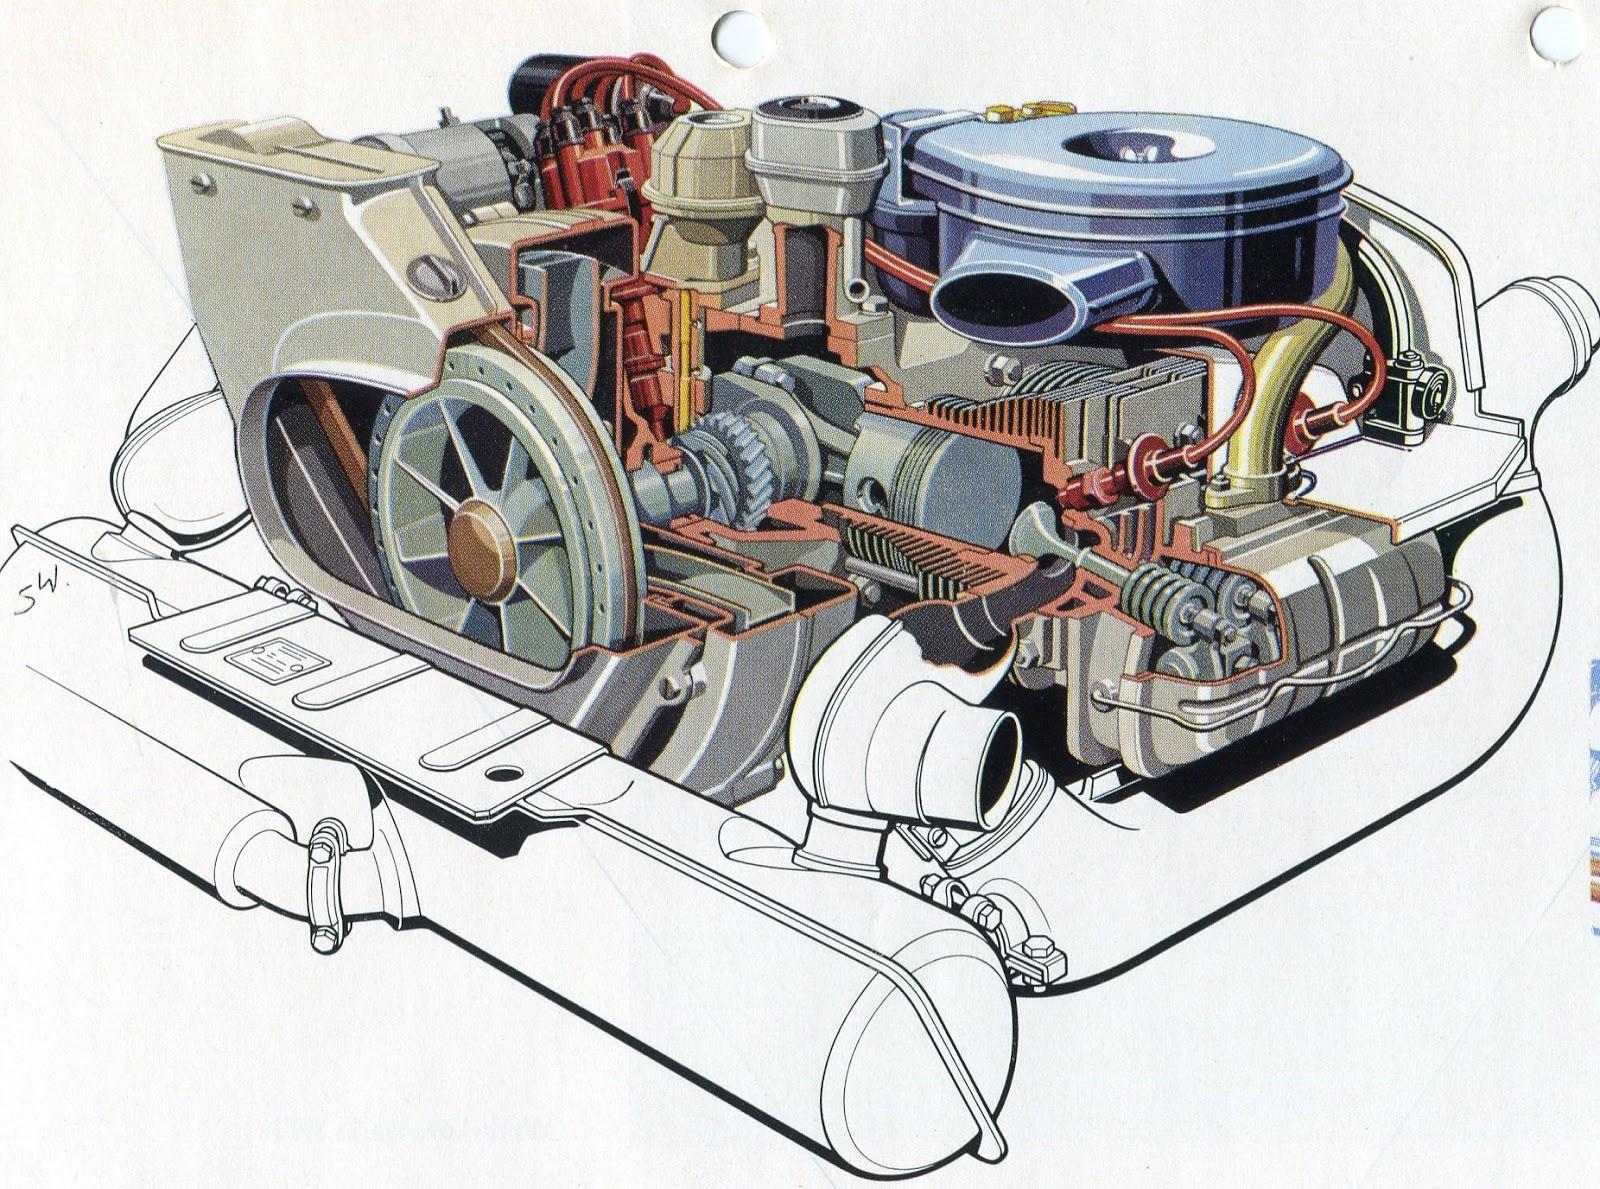 [SCHEMATICS_48DE]  Aaron's VW-1500 Blog: Engine Reference Images including OKRASA Type 3 | Vw 1500 Engine Diagram |  | Aaron's VW-1500 Blog - blogger